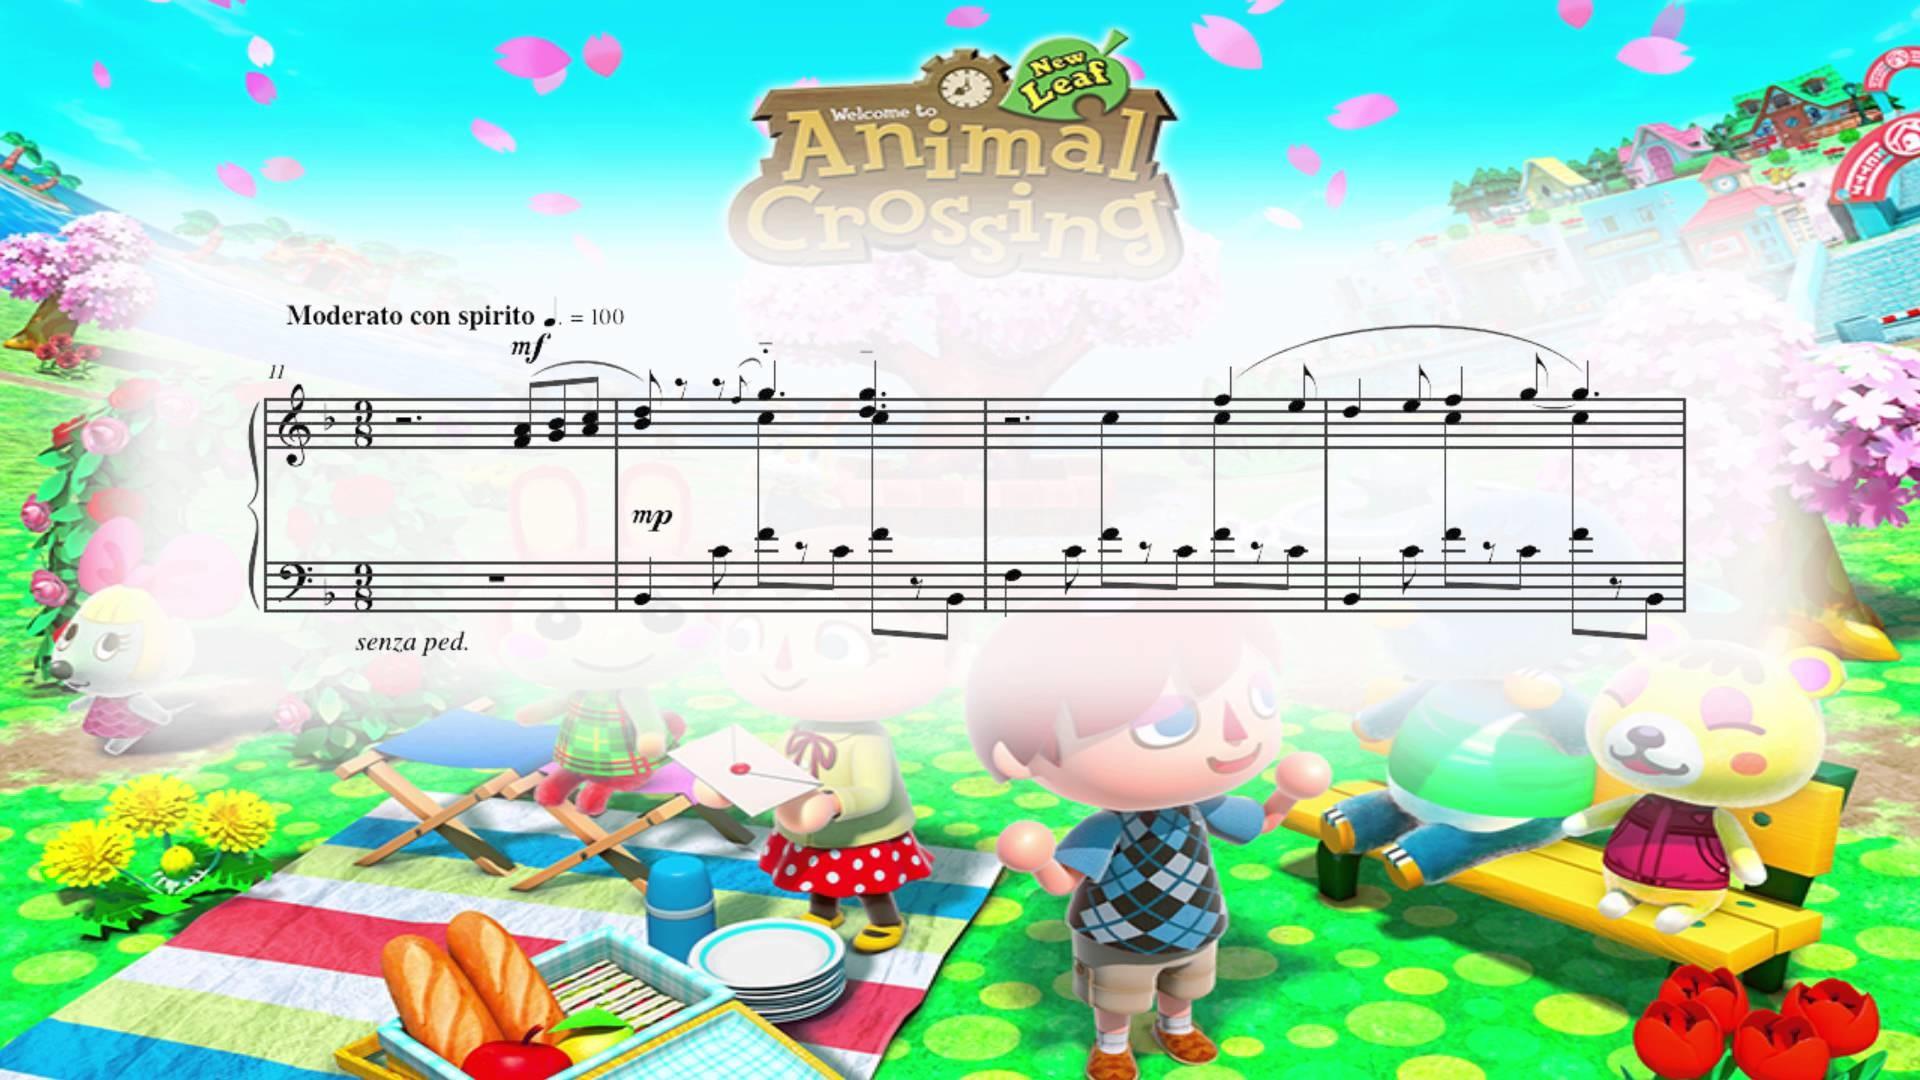 Animal Crossing: New Leaf – Main Theme (Piano Sheet Music)